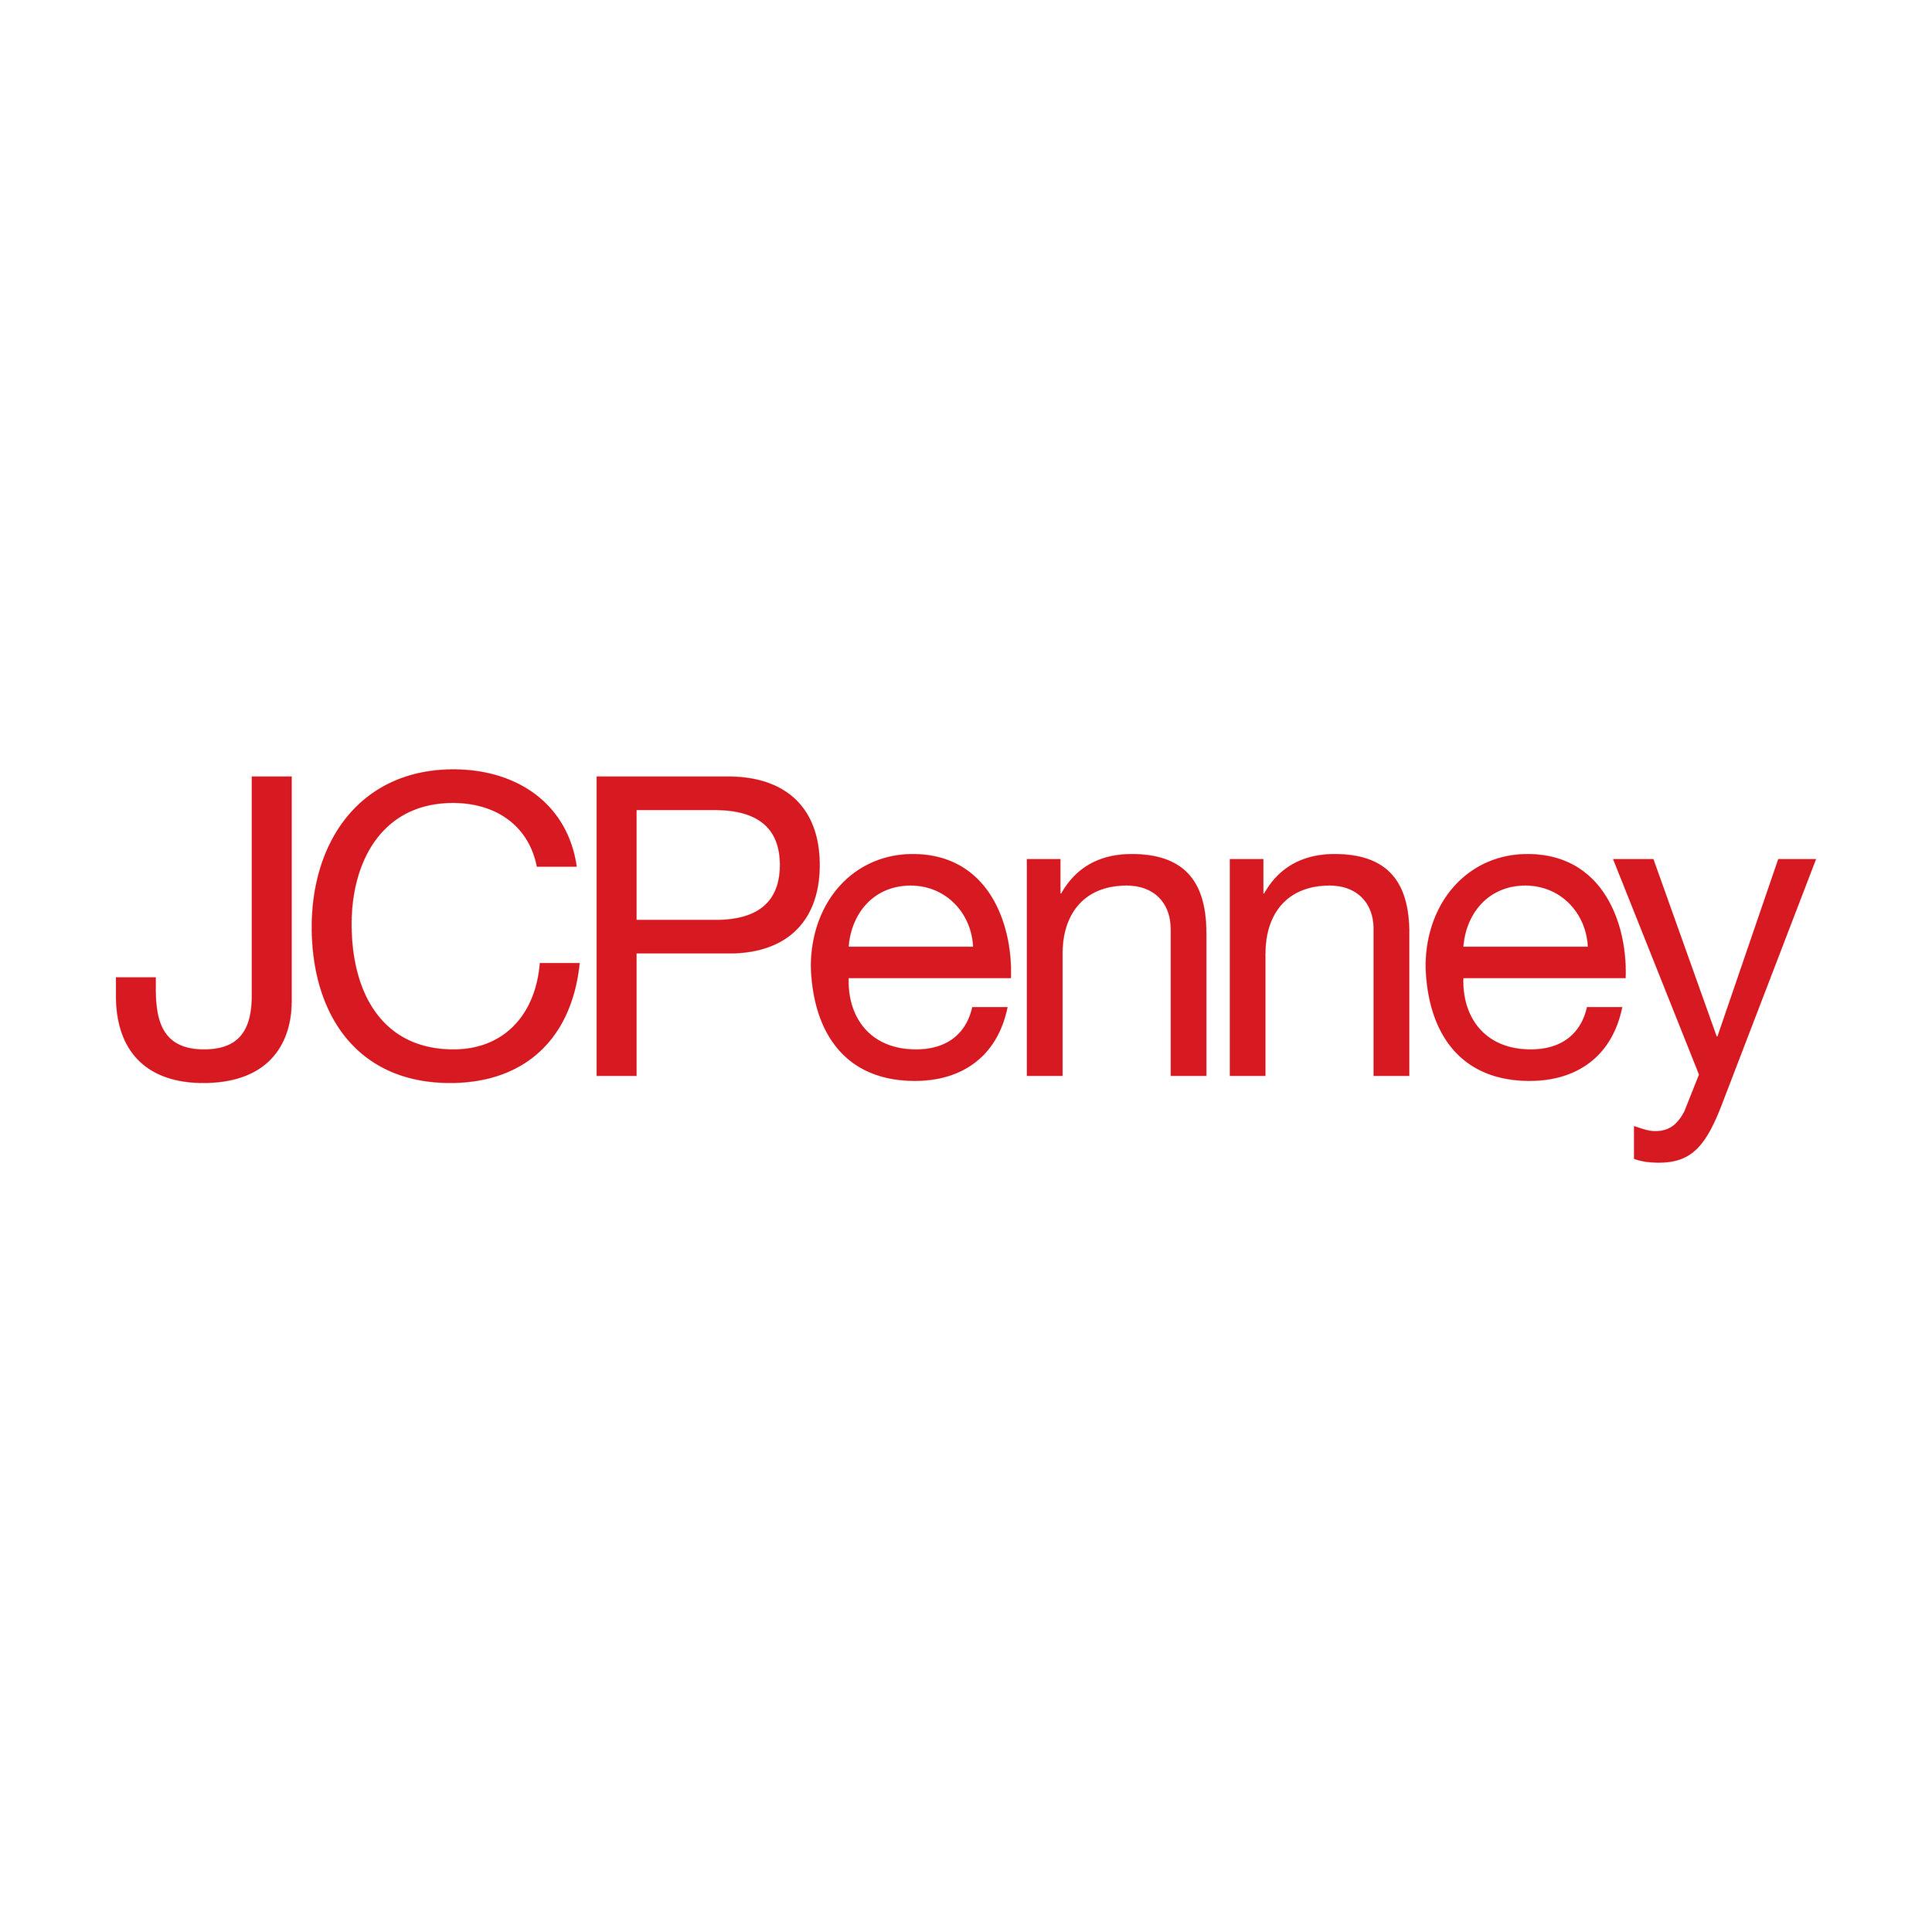 JCP-01.jpg